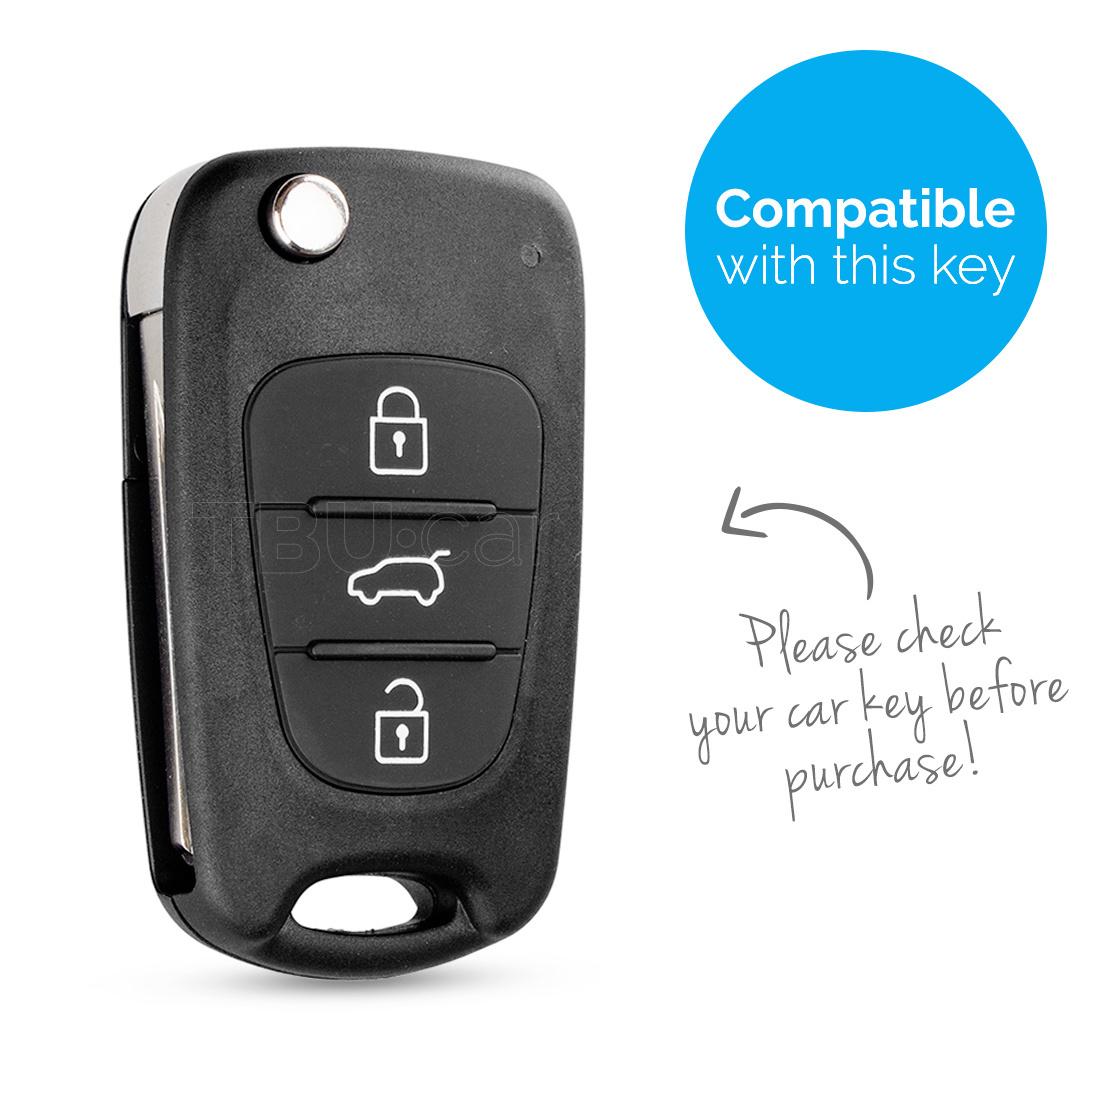 TBU car Autoschlüssel Hülle für Kia 3 Tasten - Schutzhülle aus Silikon - Auto Schlüsselhülle Cover in Lindgrün